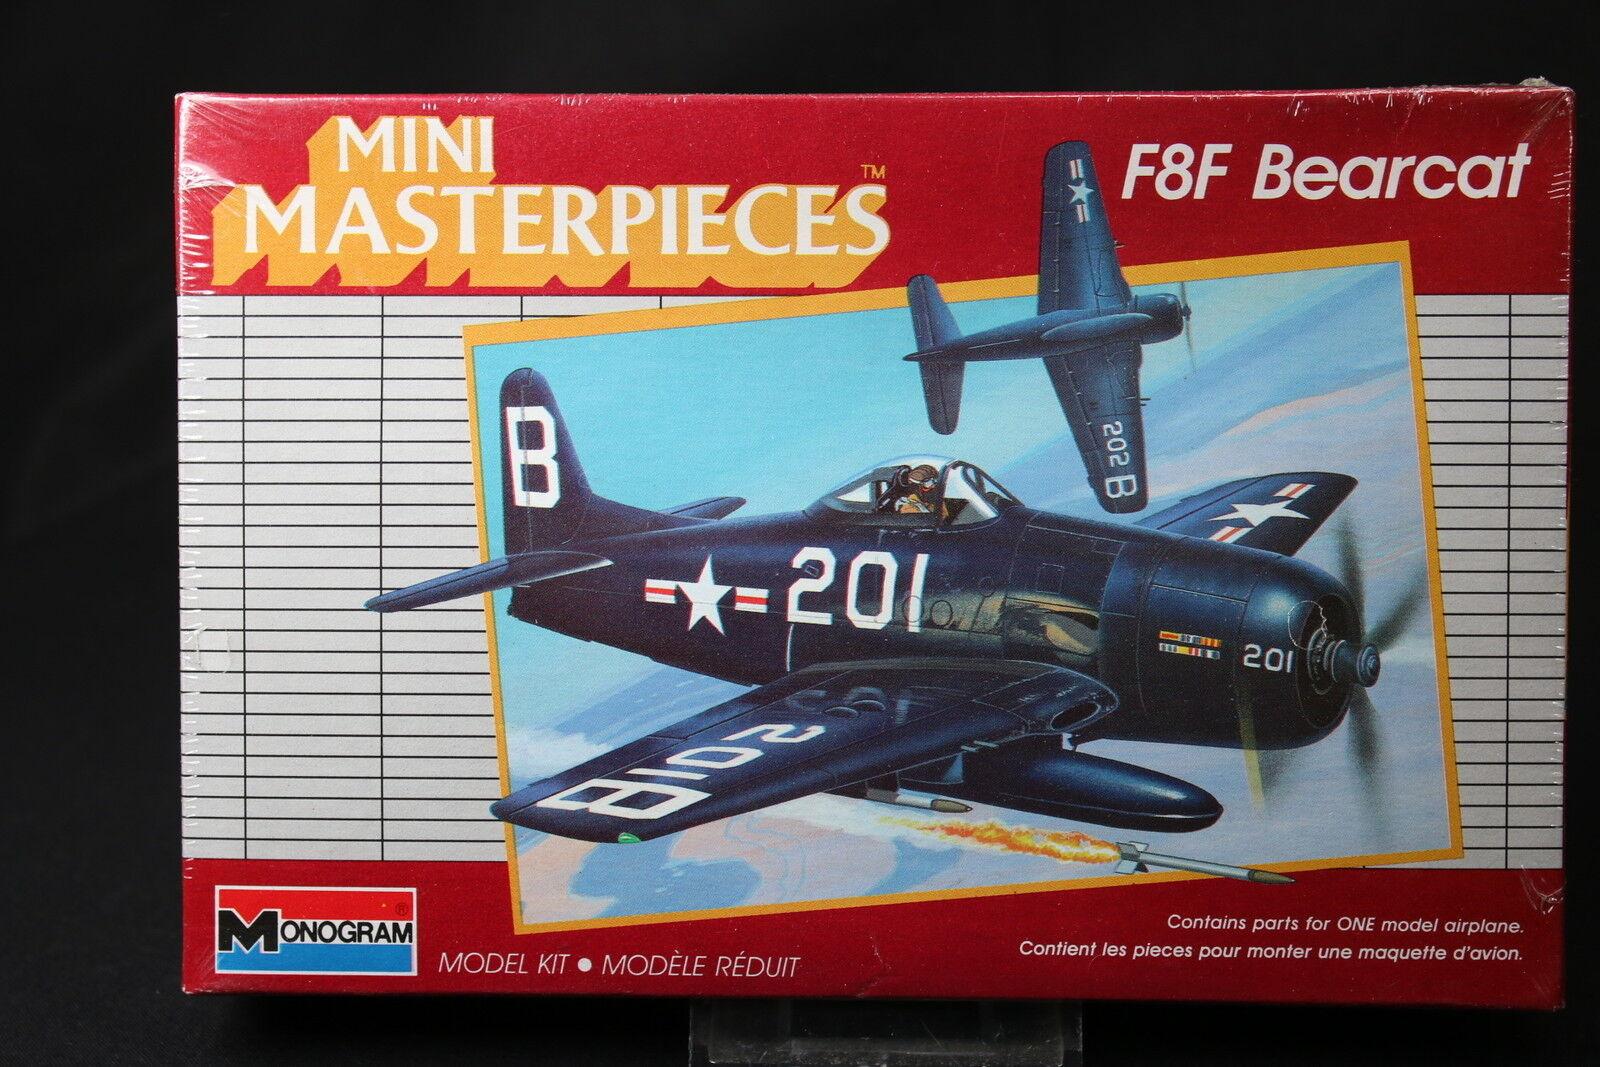 YE062 MONOGRAM 1/72 maquette avion 5013 F8F Bearcat Mini Masterpieces